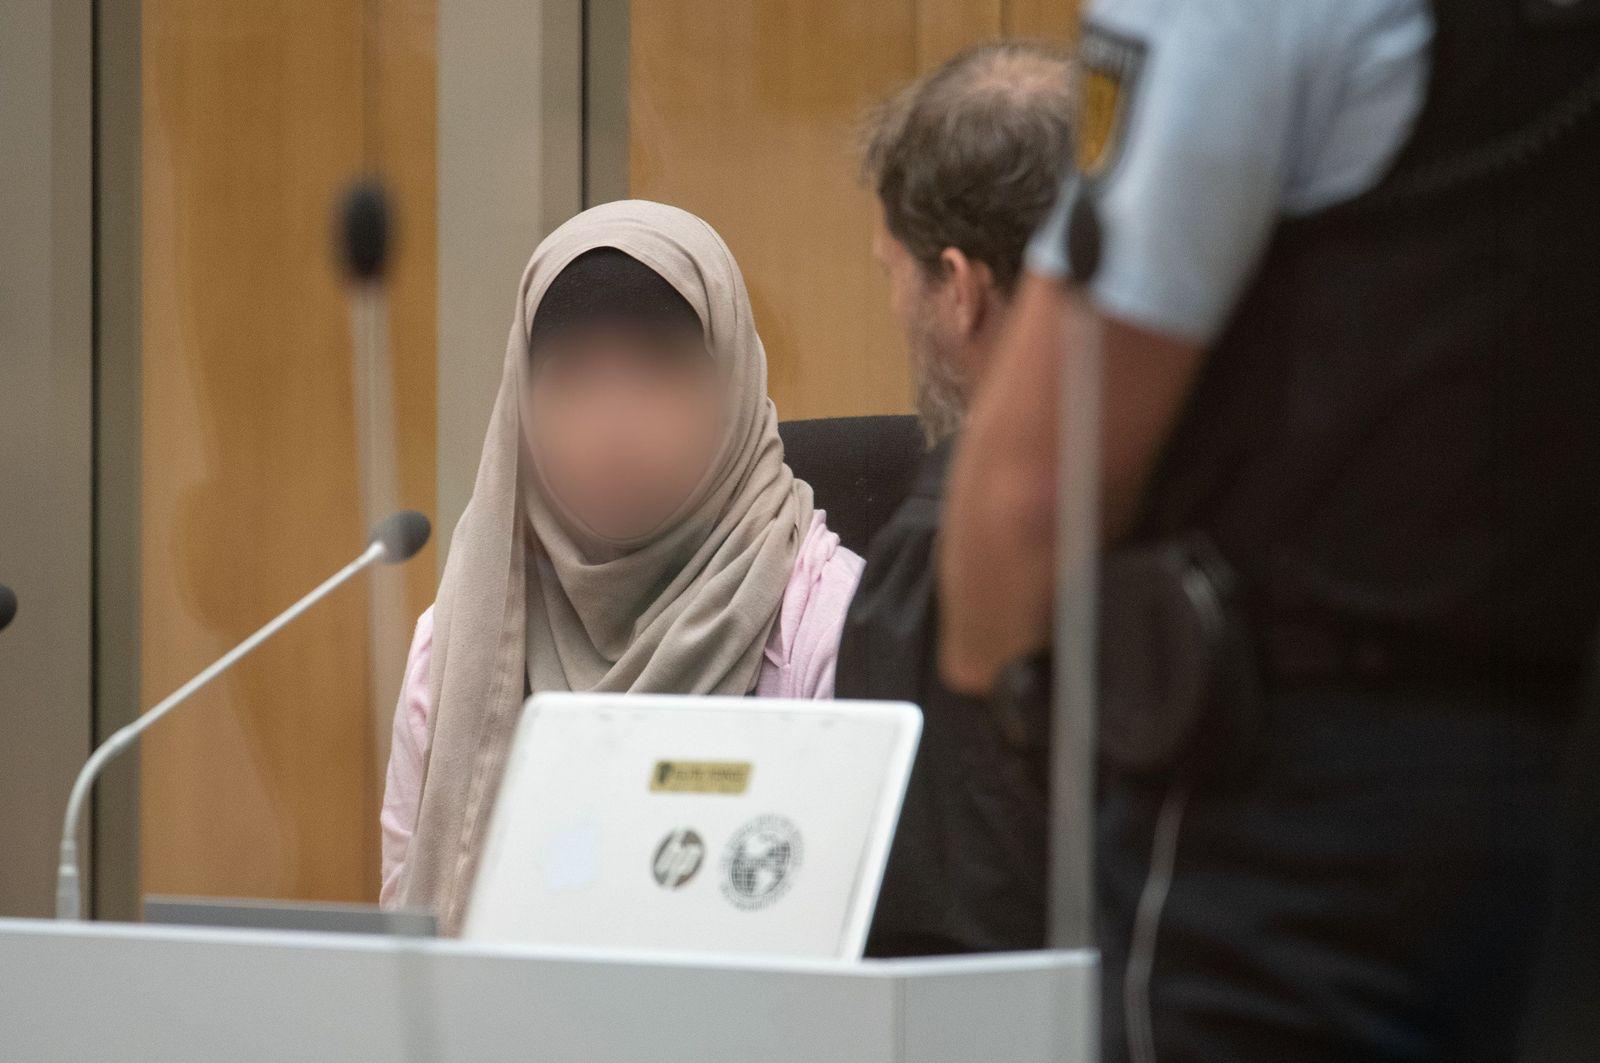 Prozess gegen mutmaßliche IS-Rückkehrerin